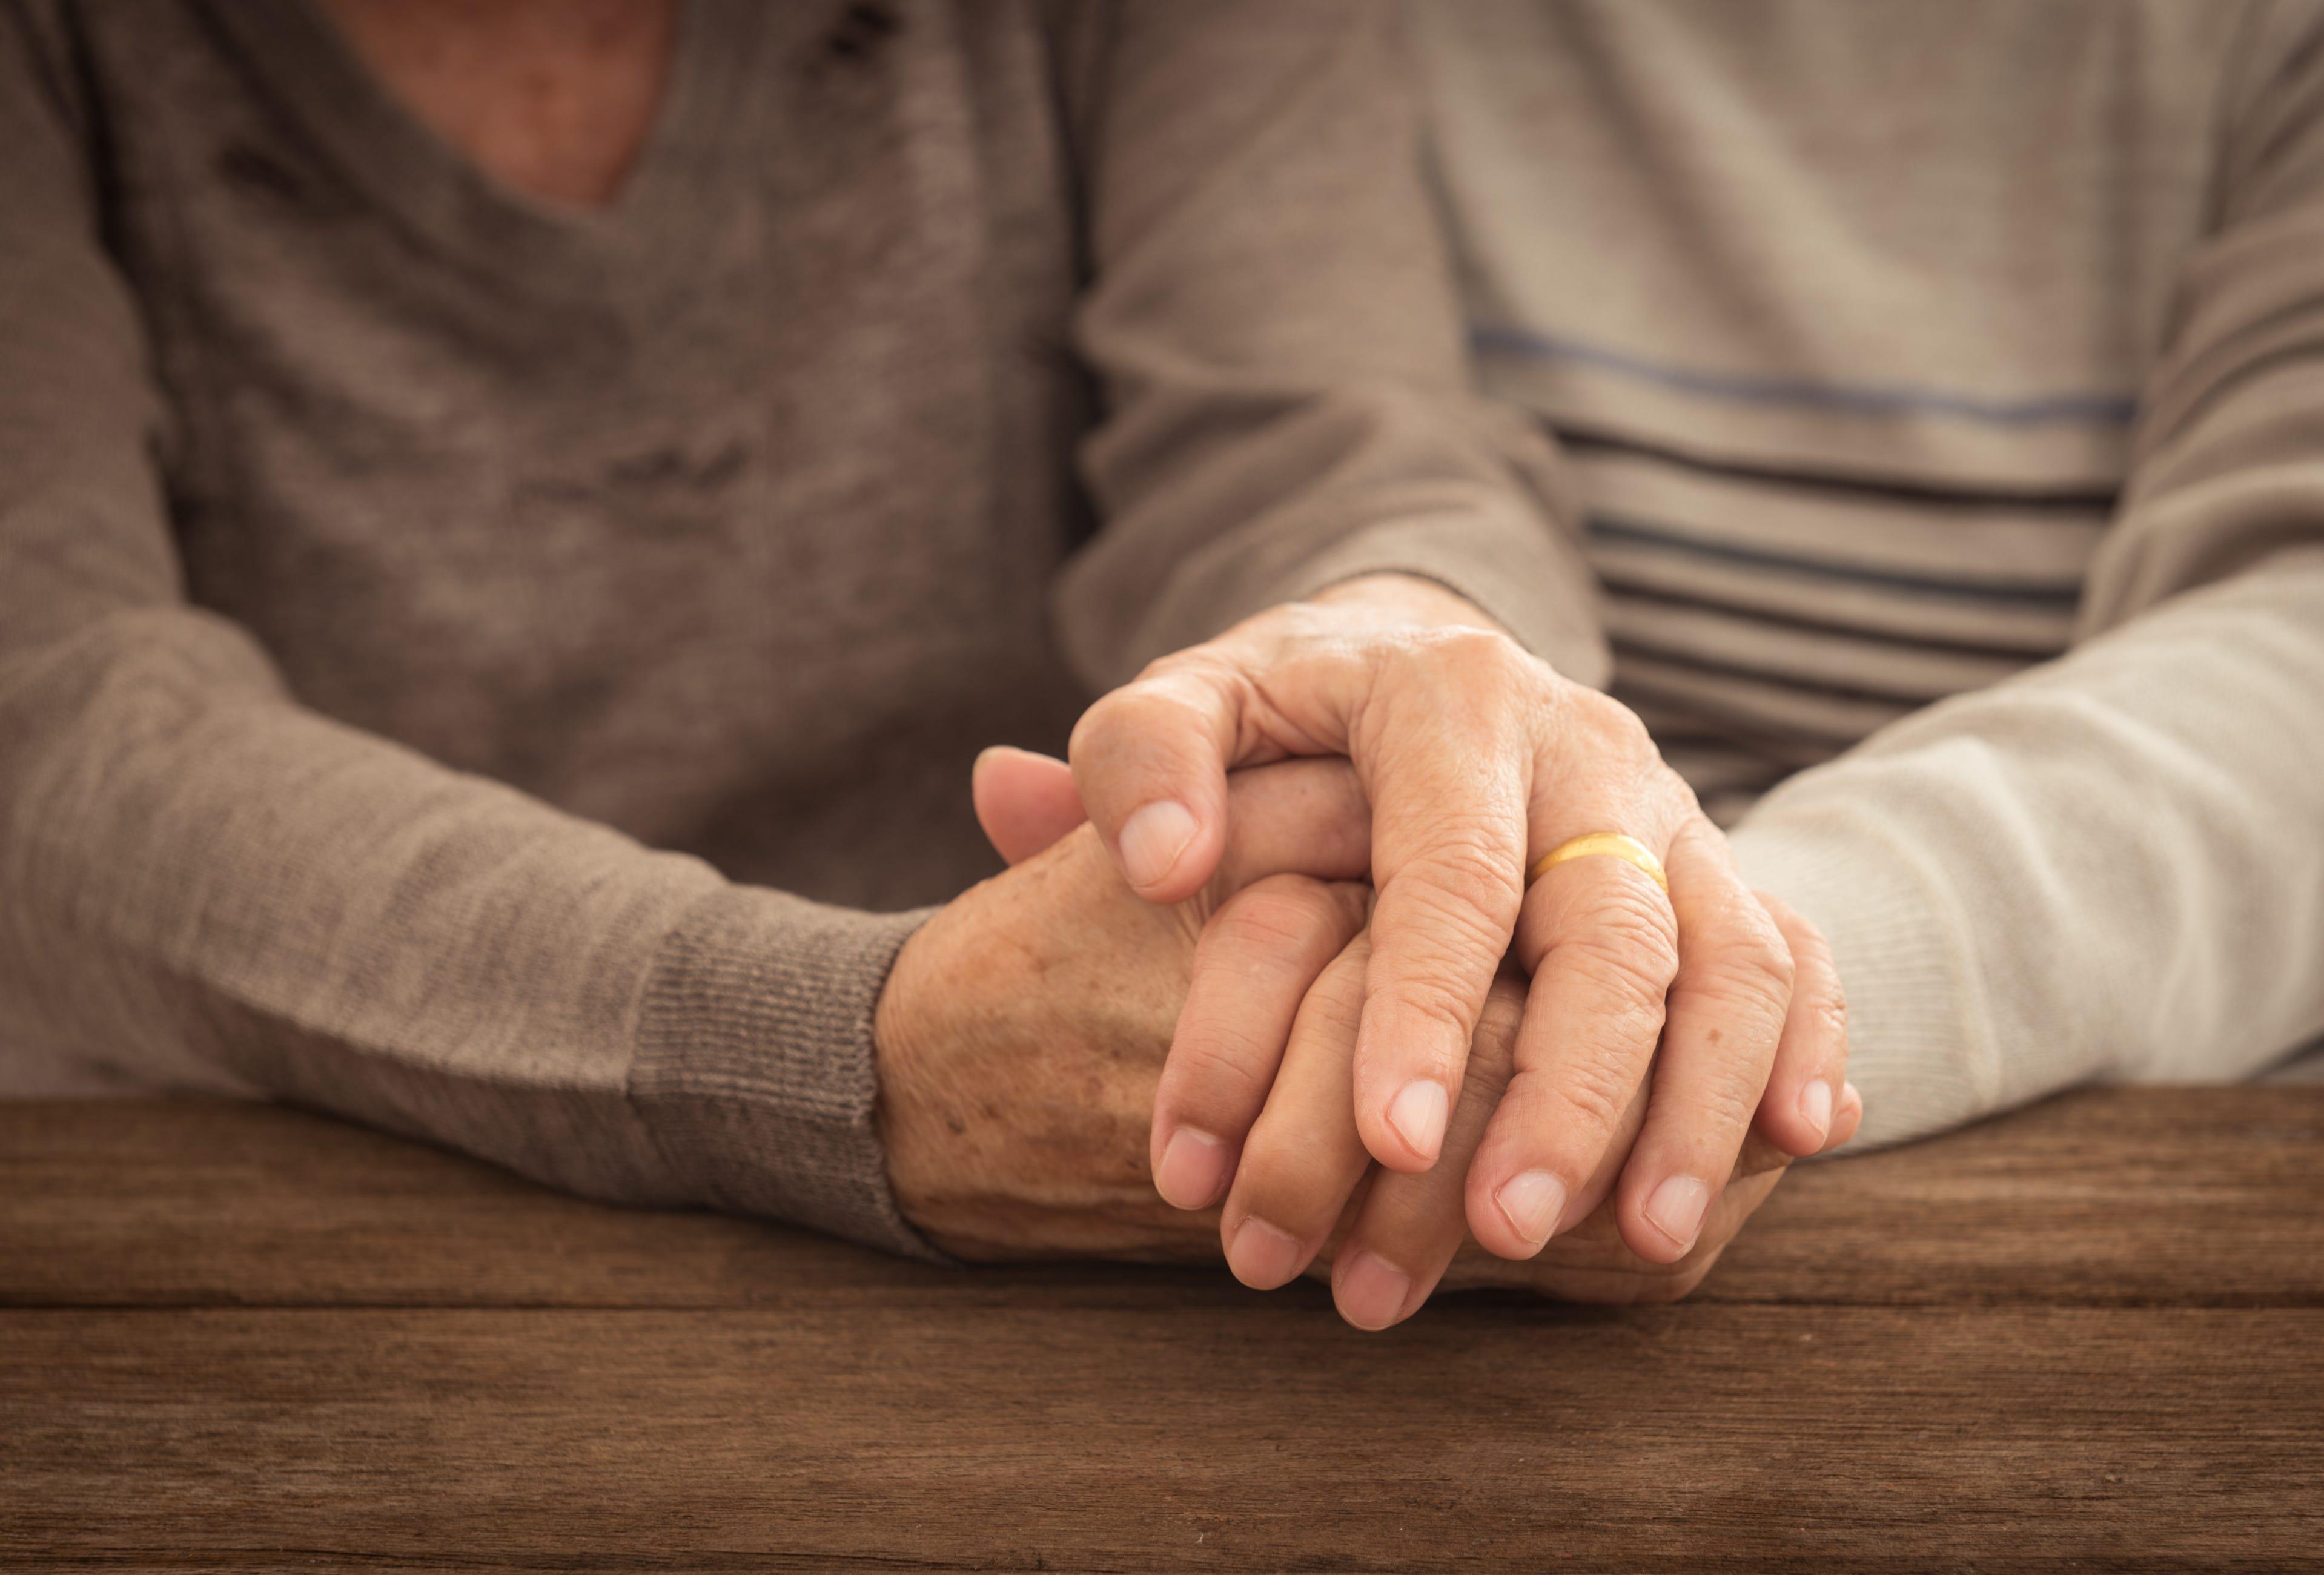 Widow/widower financial preparedness 101: 5 things to do right now